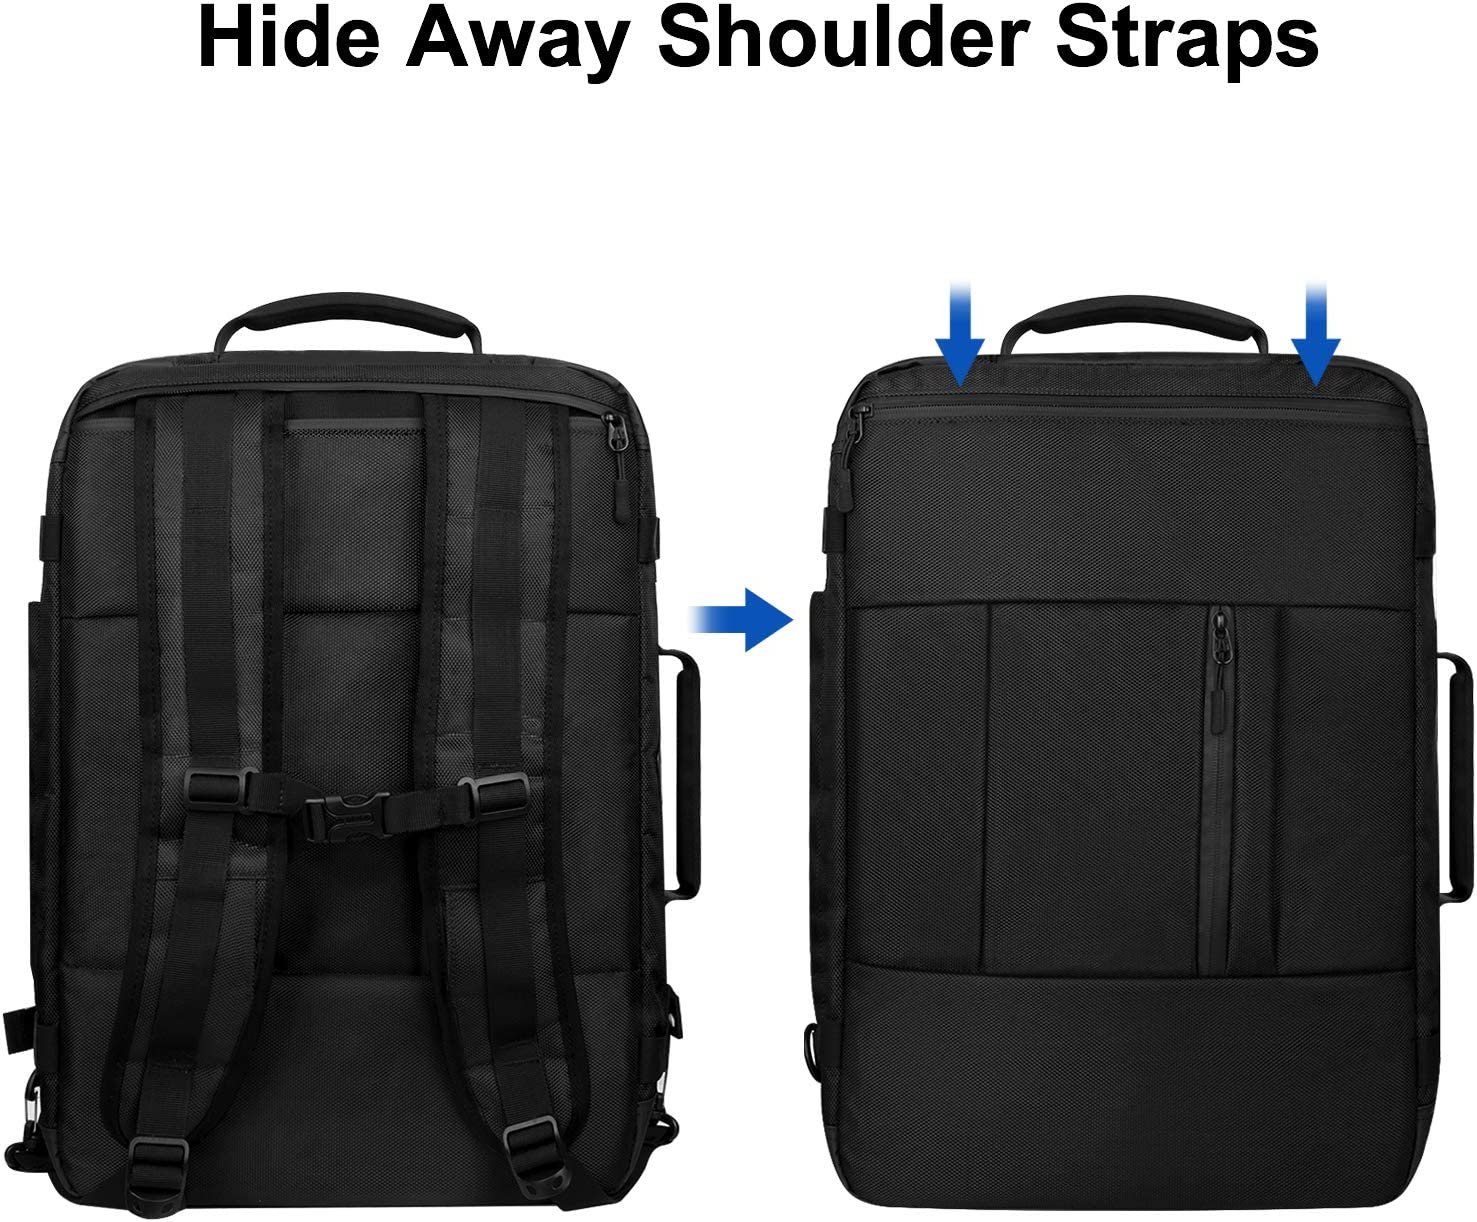 Carry on Laptop Backpack, 40L Large Travel Backpack Flight Approved Carry-on Luggage Backpack Weekender Bag for Men Women, Water Resistant Business Laptop Backpack Fits 17.3 Inch Laptop – Black